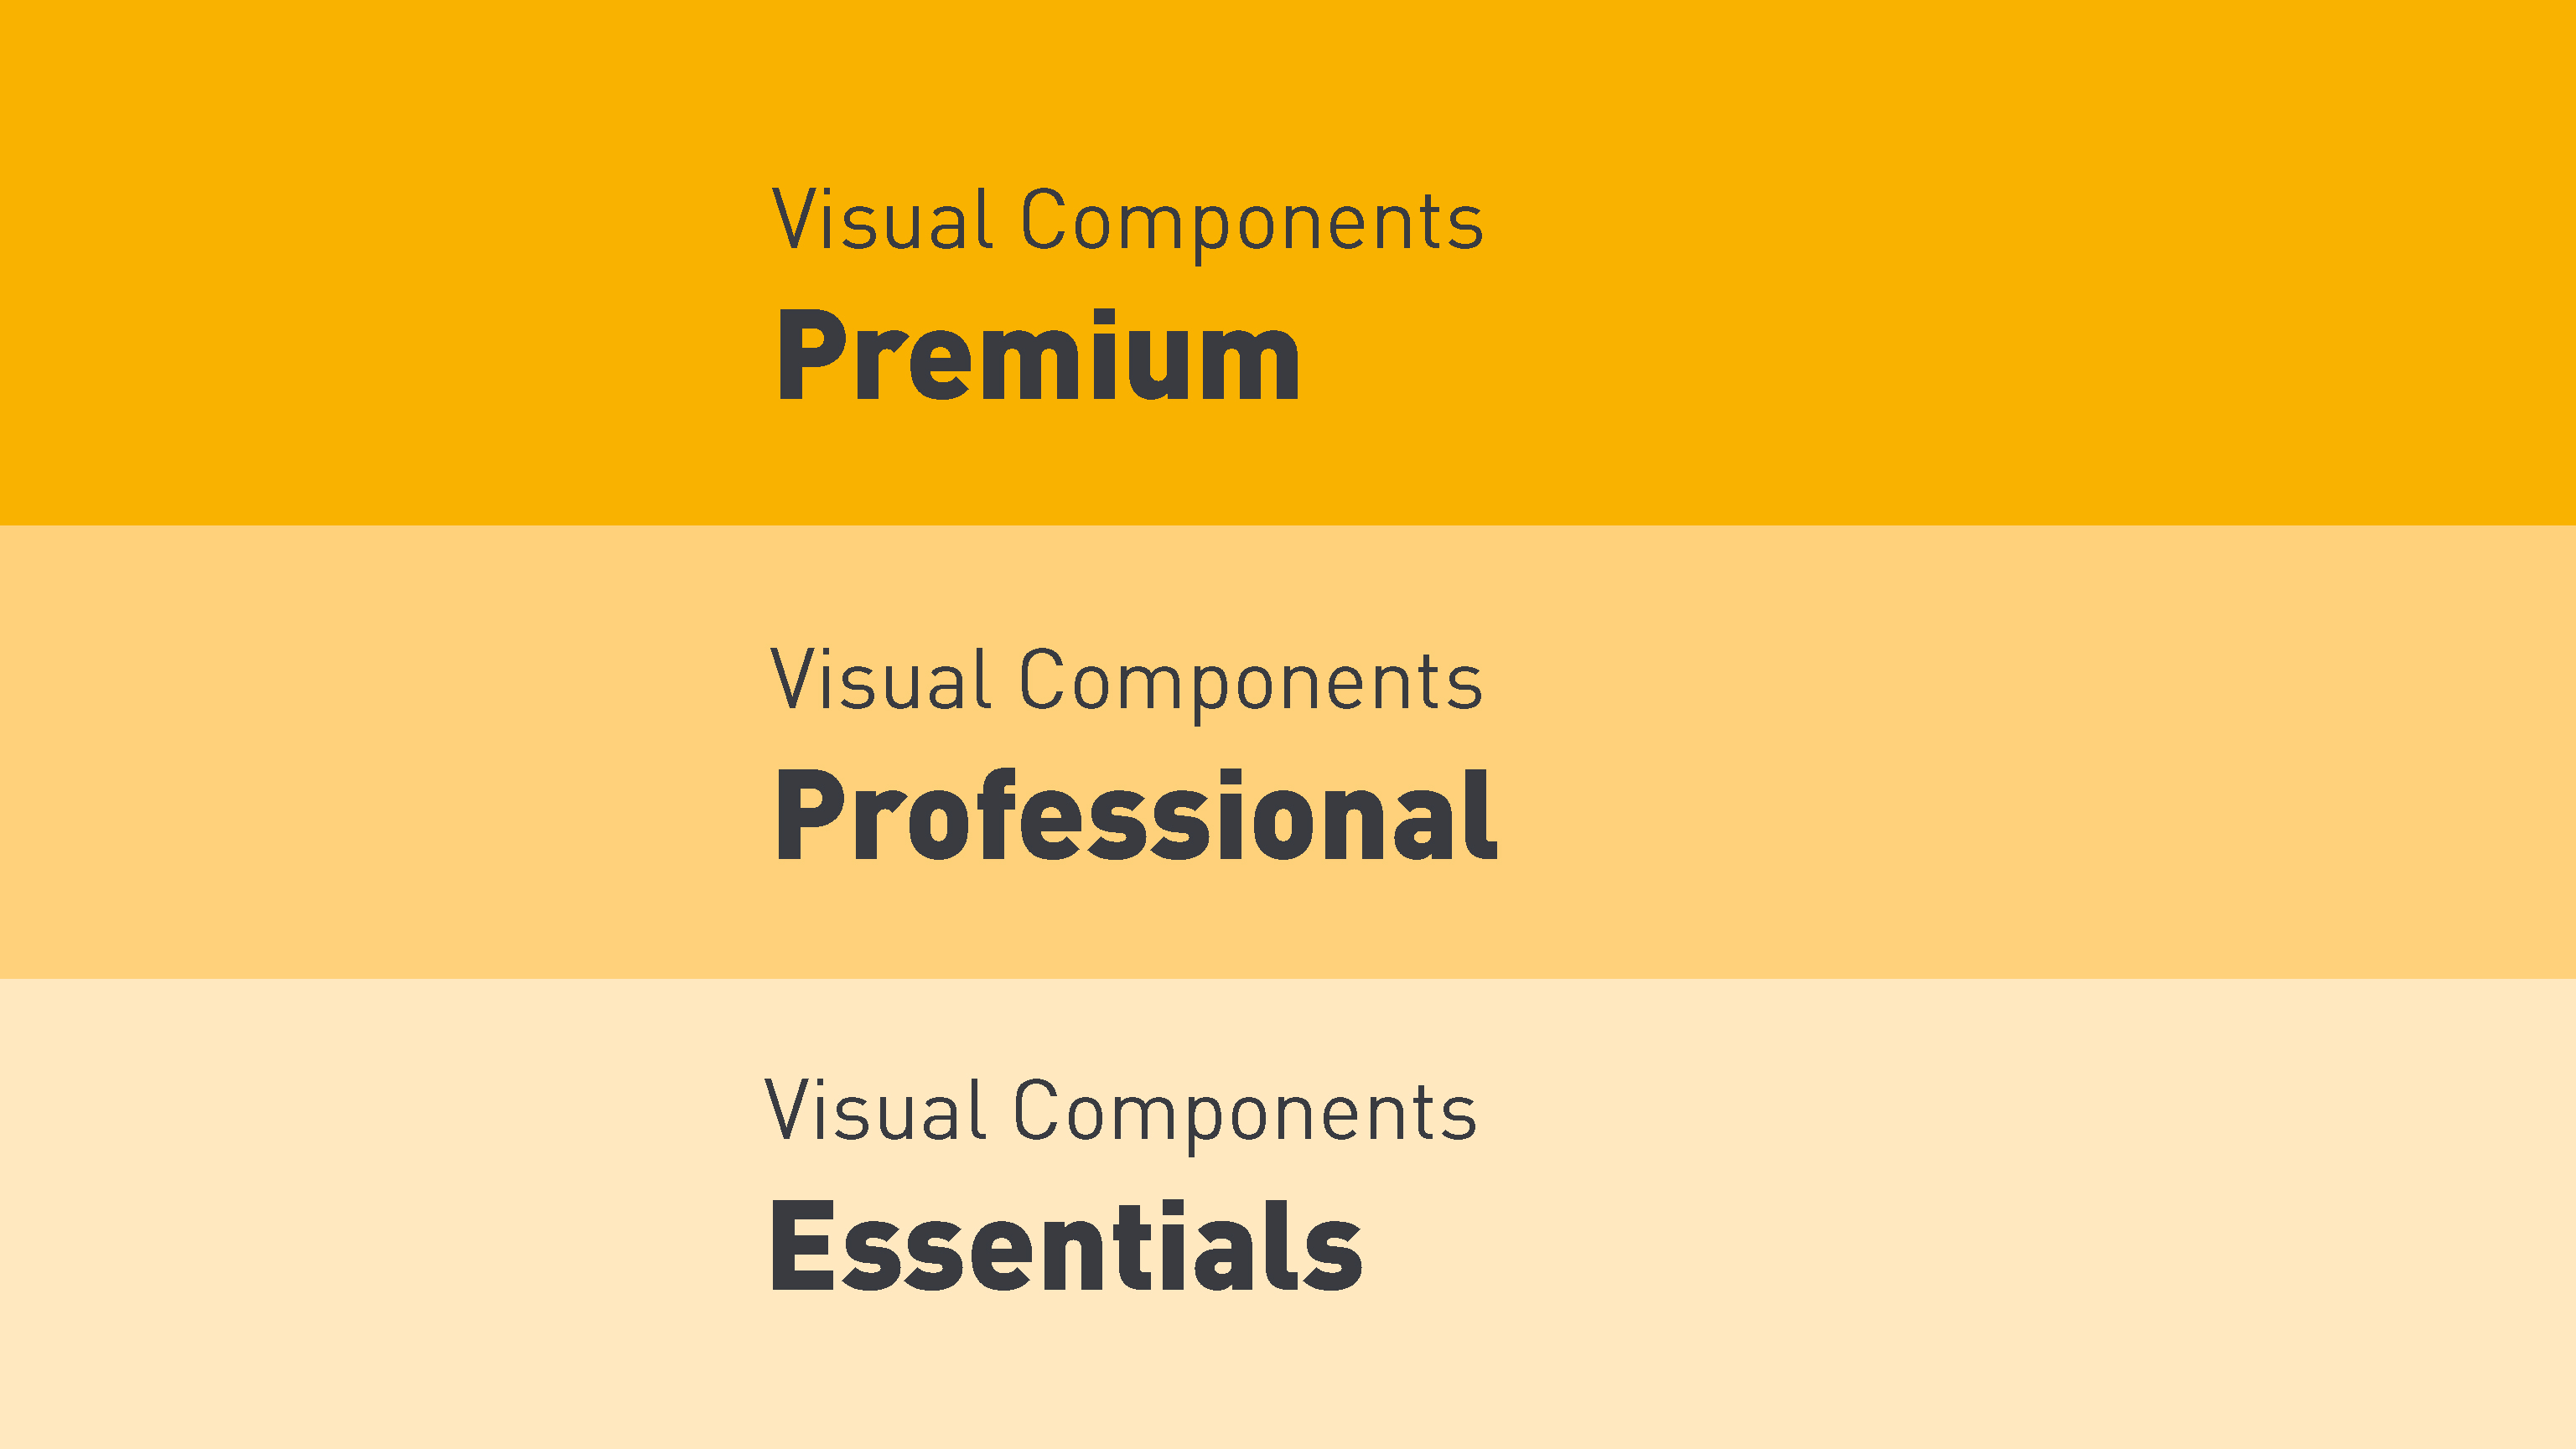 DUALIS stellt Visual Components 4.0 vor - neue Produktfamilie